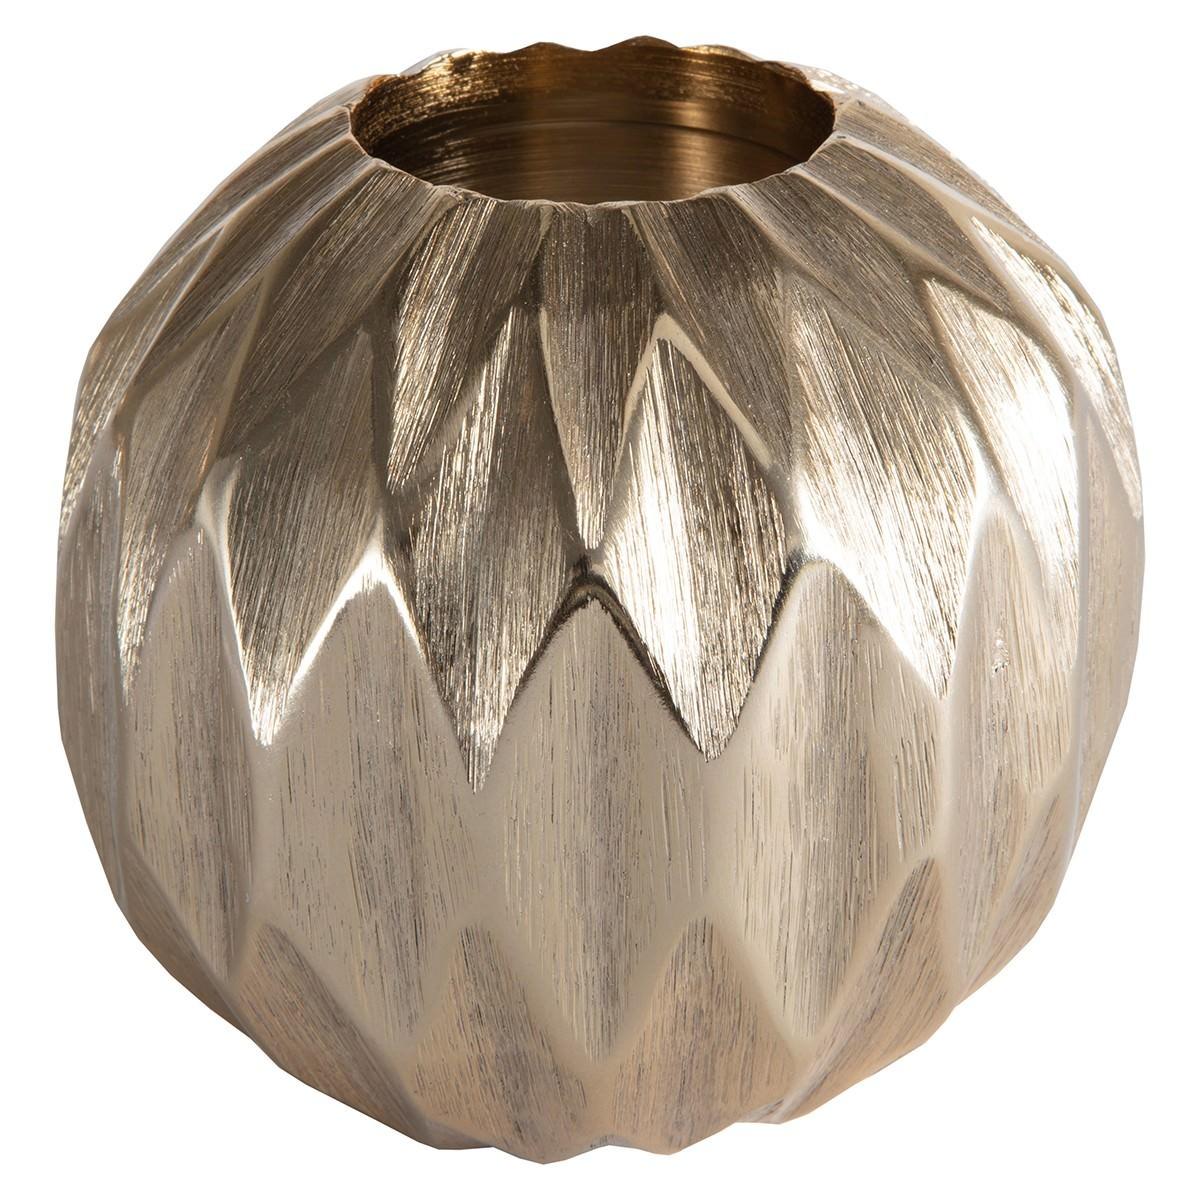 Kinto Diamond Ball Tealight Holder, Small, Gold